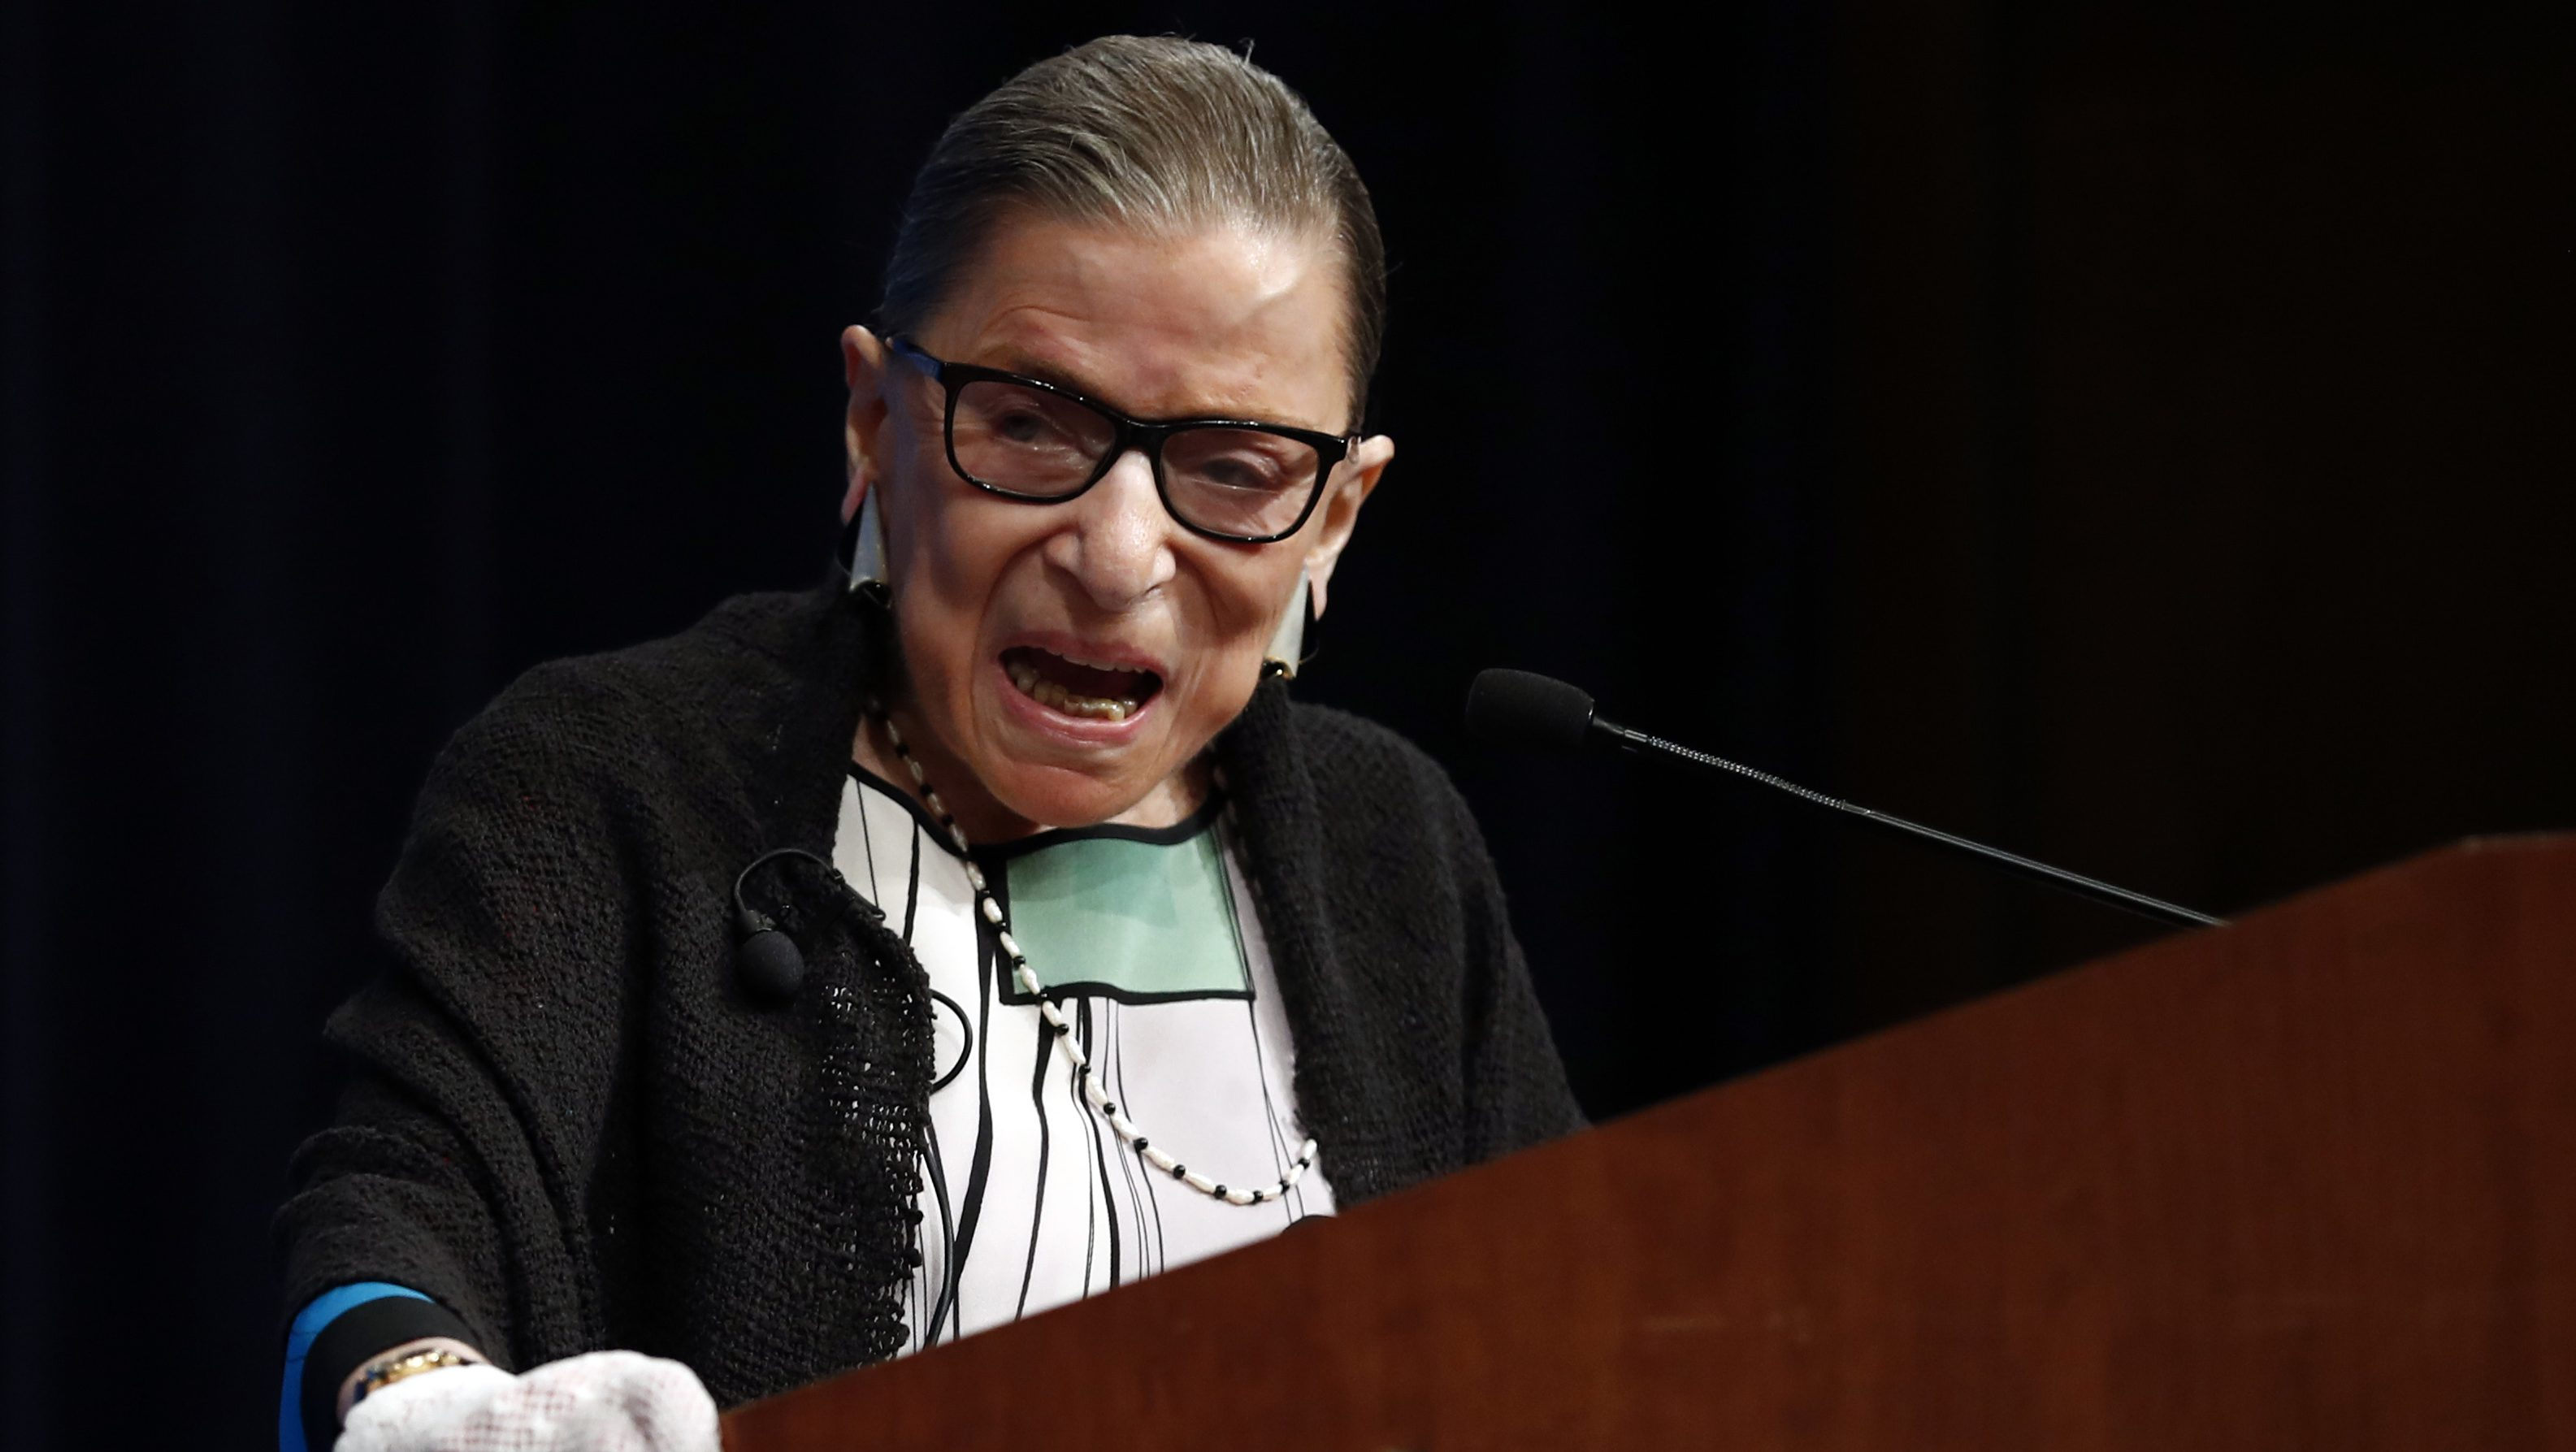 Ruth Bader Ginsburg Hopes to Serve 5 More Years on Court  |Ruth Bader Ginsburg